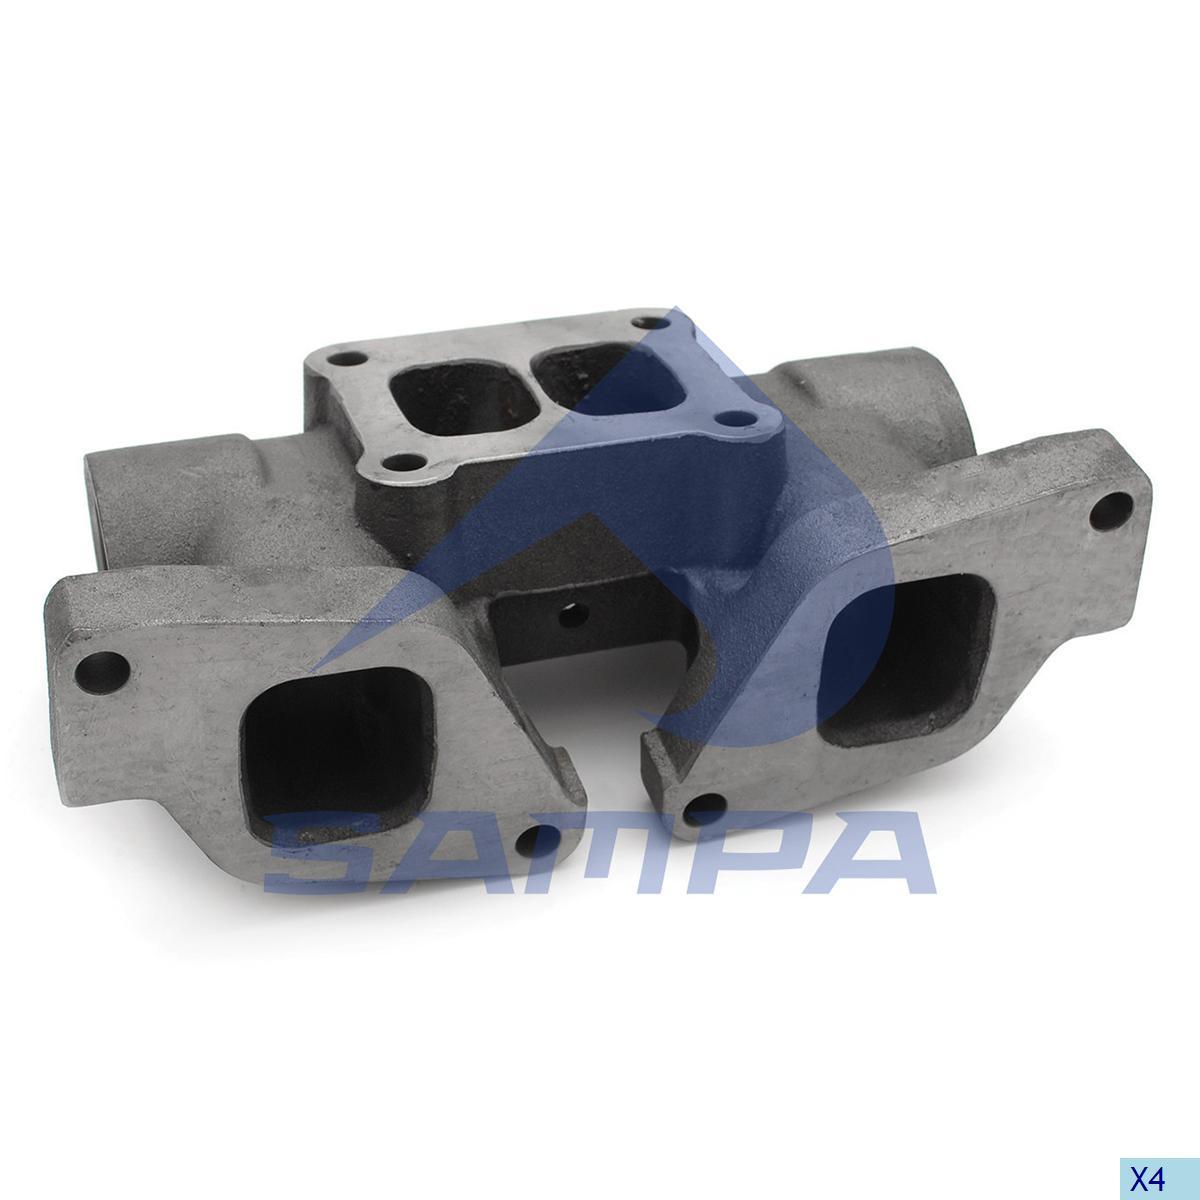 Exhaust Manifold, R.V.I., Engine